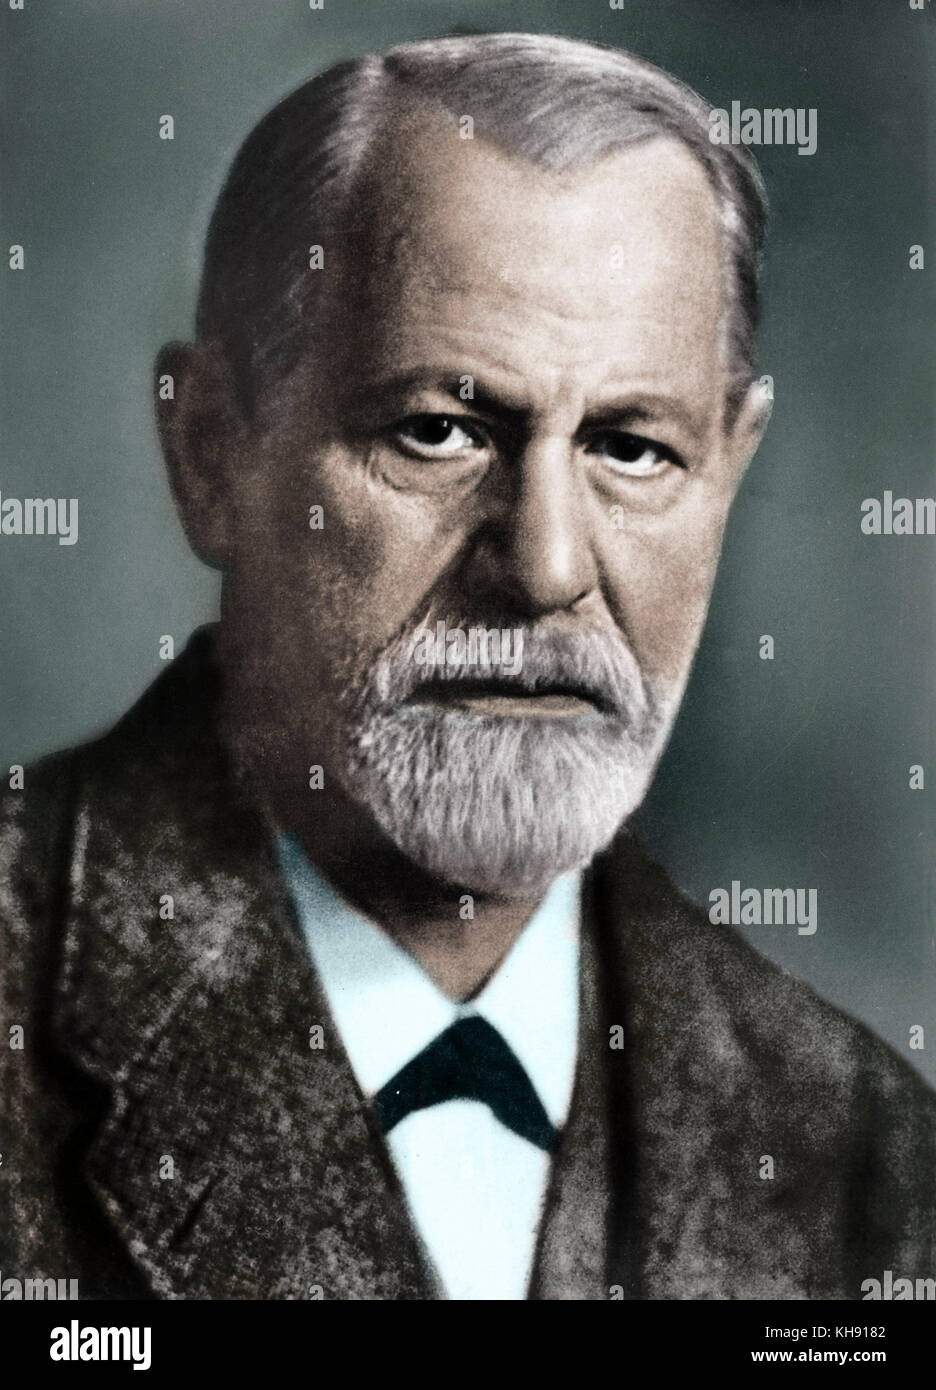 Sigmund Freud, founder of psychoanalysis. born Moravia, 1856-1939. - Stock Image